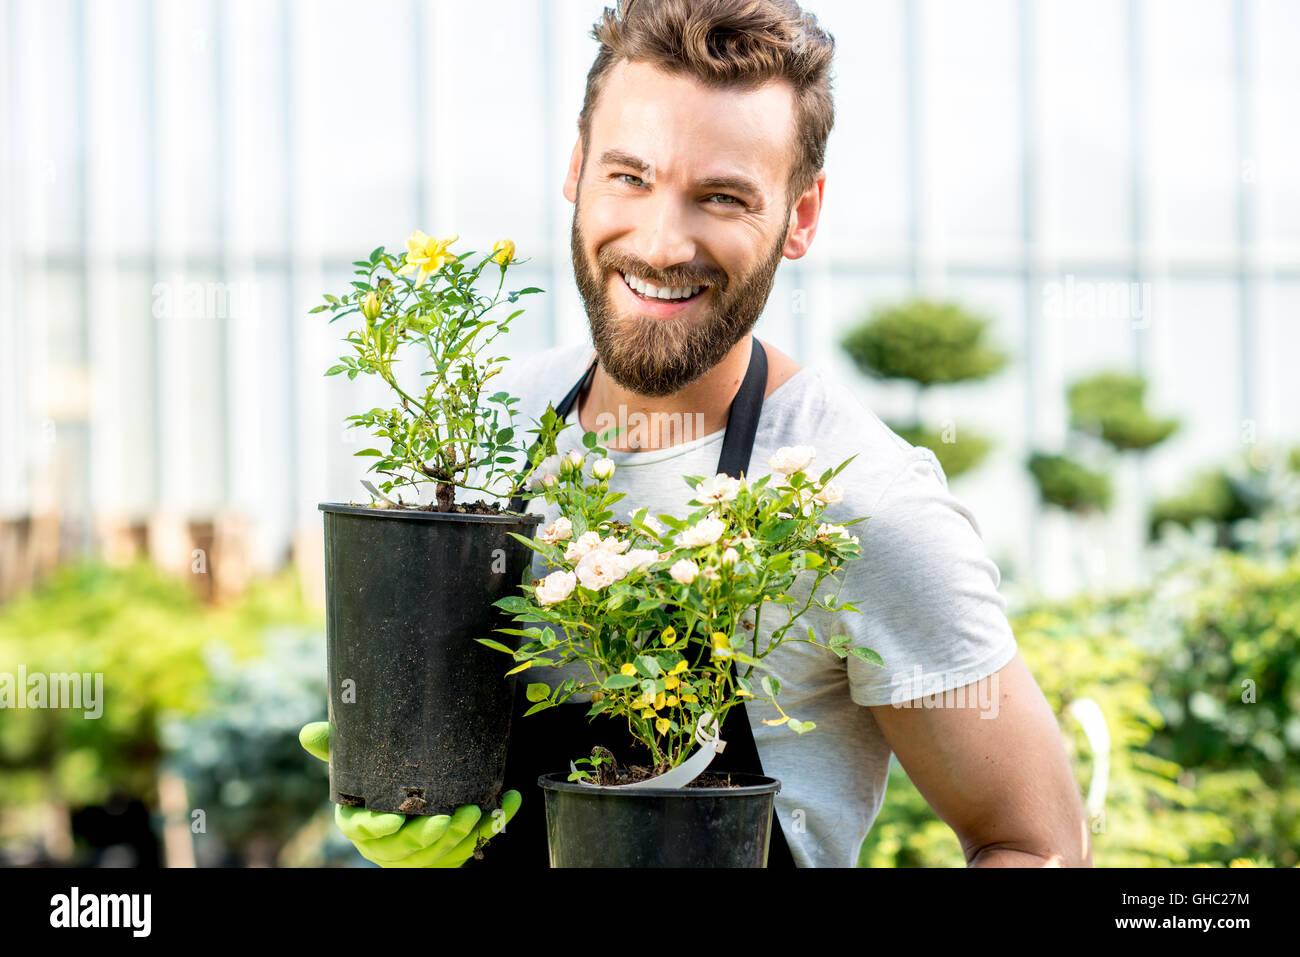 Gardener with a flowerpot - Stock Image